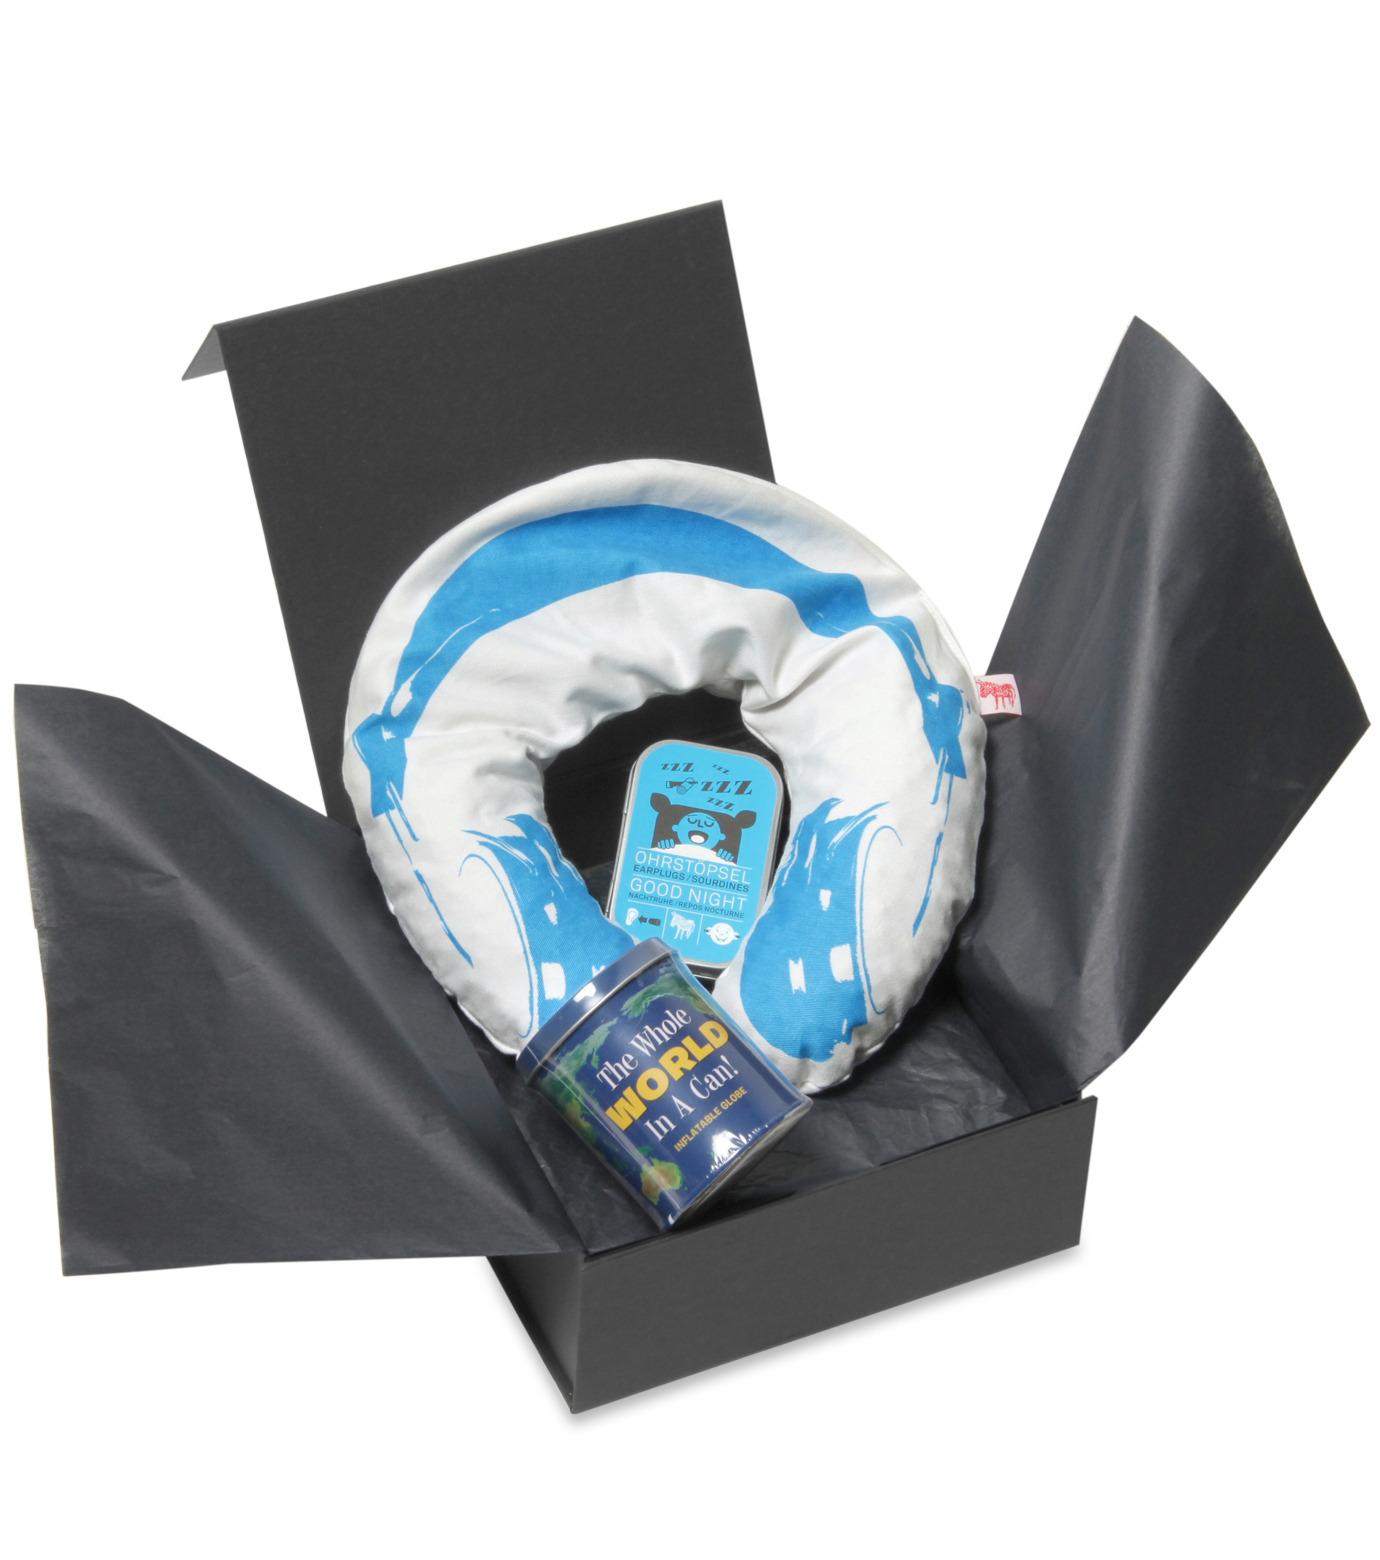 Gift Set(ギフトセット)のWorld Travel-NONE-Giftset-trav-0 拡大詳細画像1